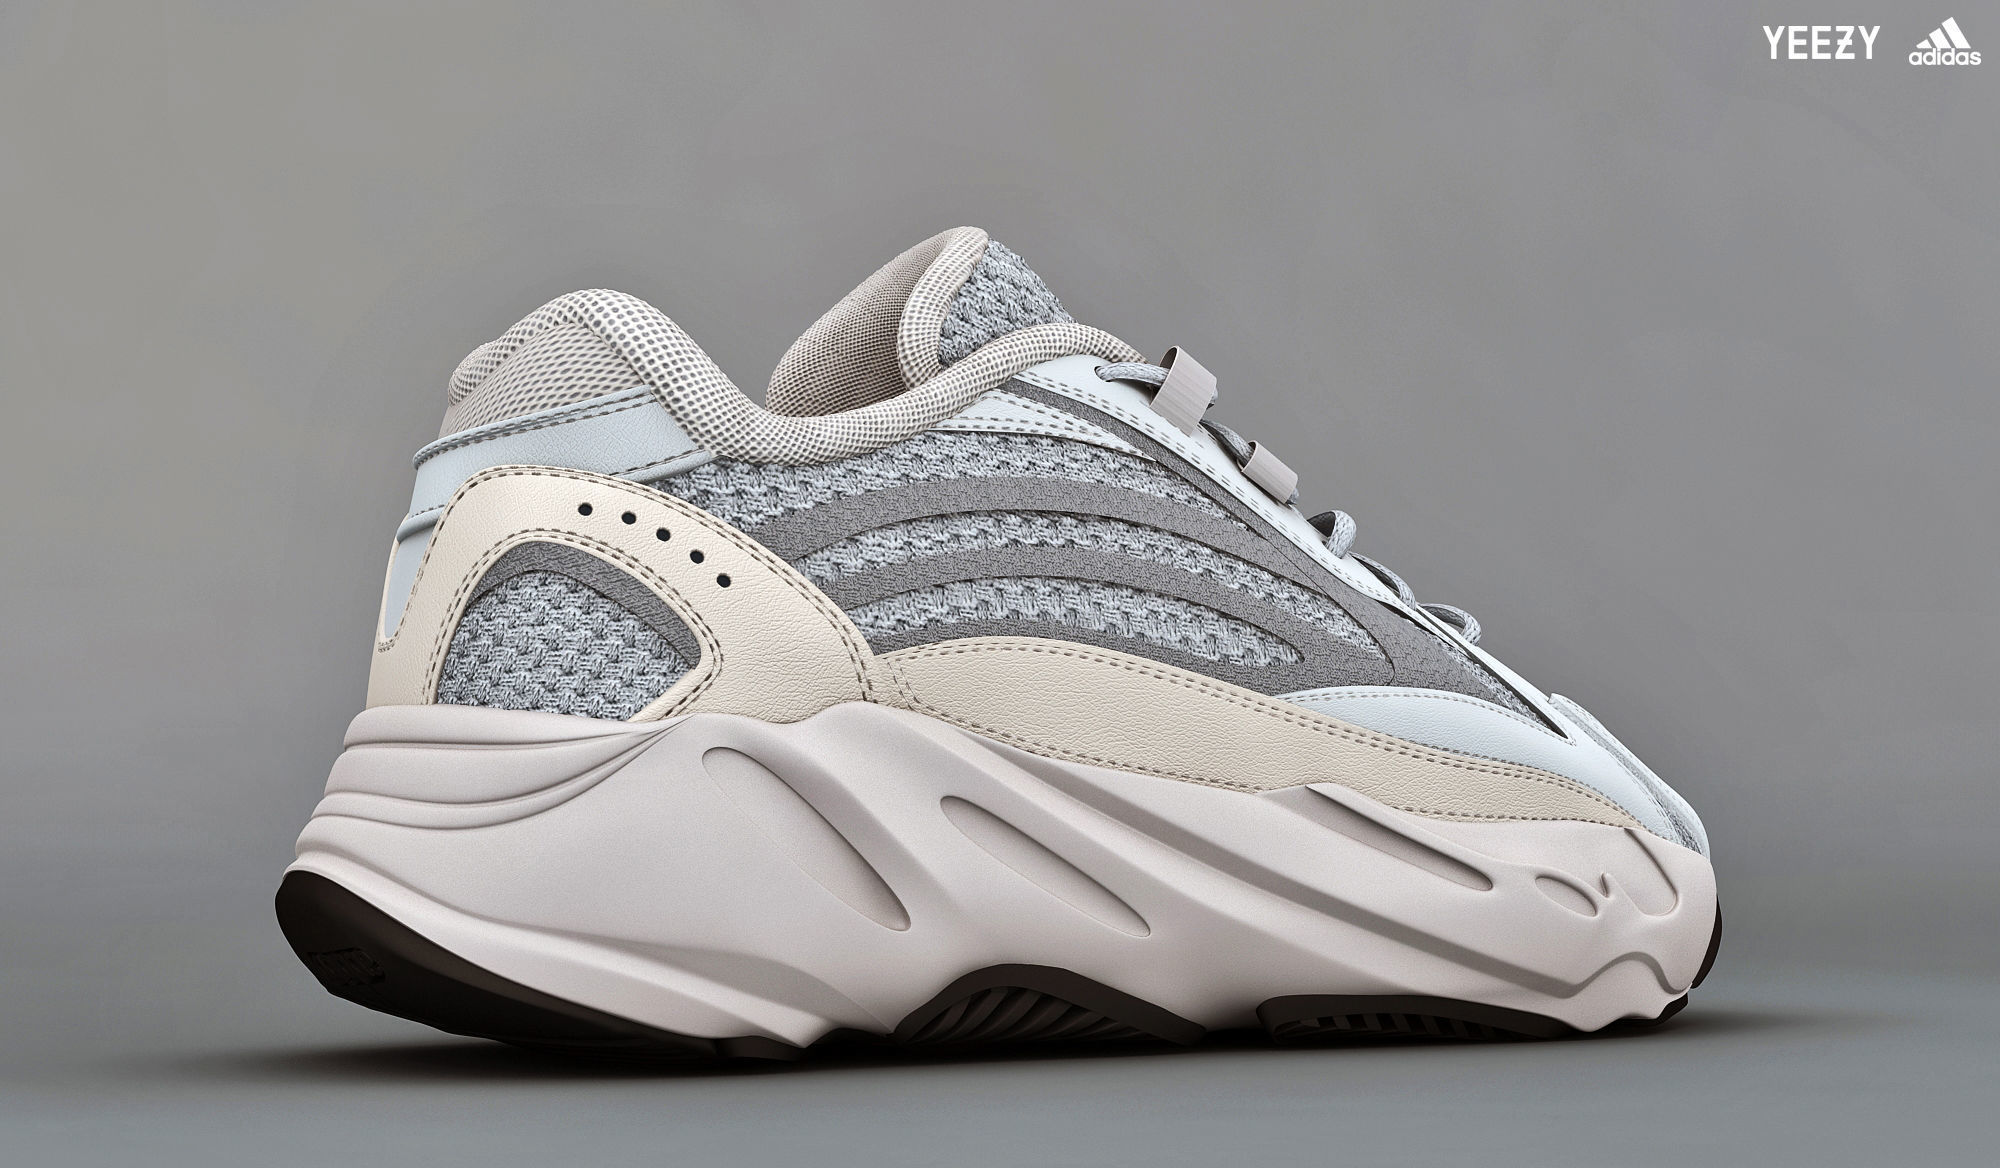 453b6bfb2a0a7c ... adidas yeezy boost 700 v 2 static 3d model low-poly max obj mtl 3 ...